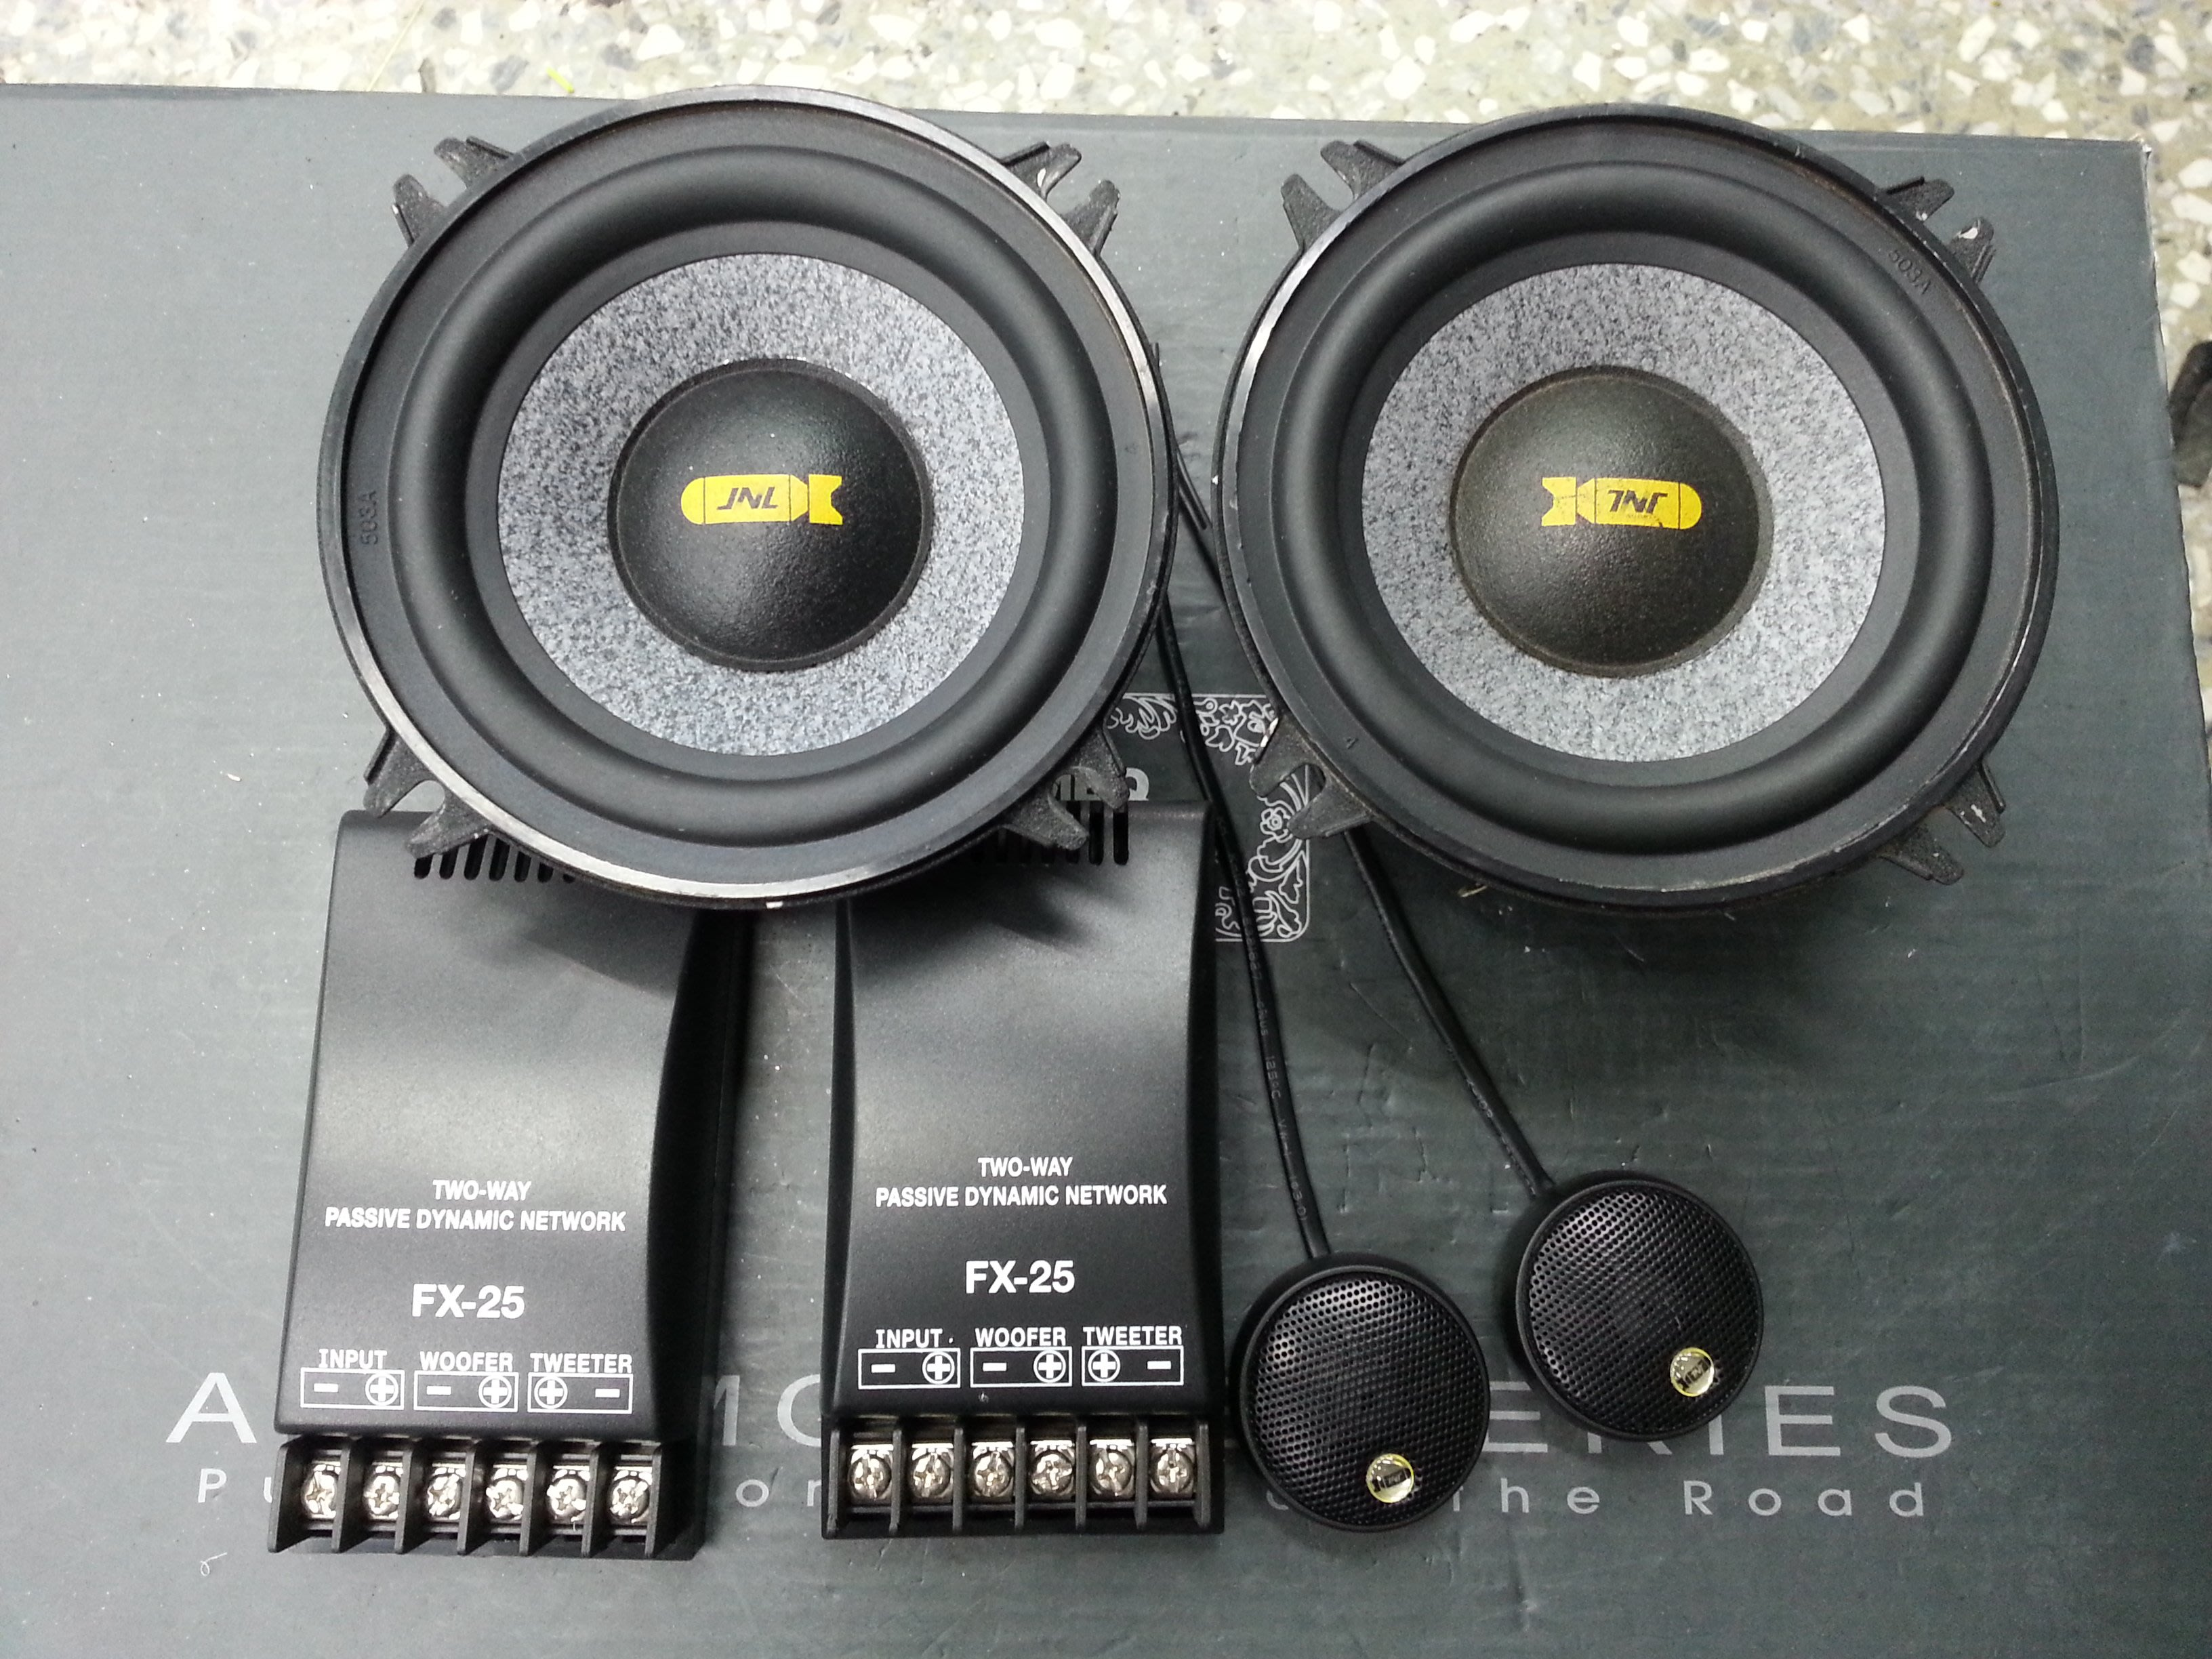 TNT 5吋 兩音路分音喇叭.非新品.功能正常